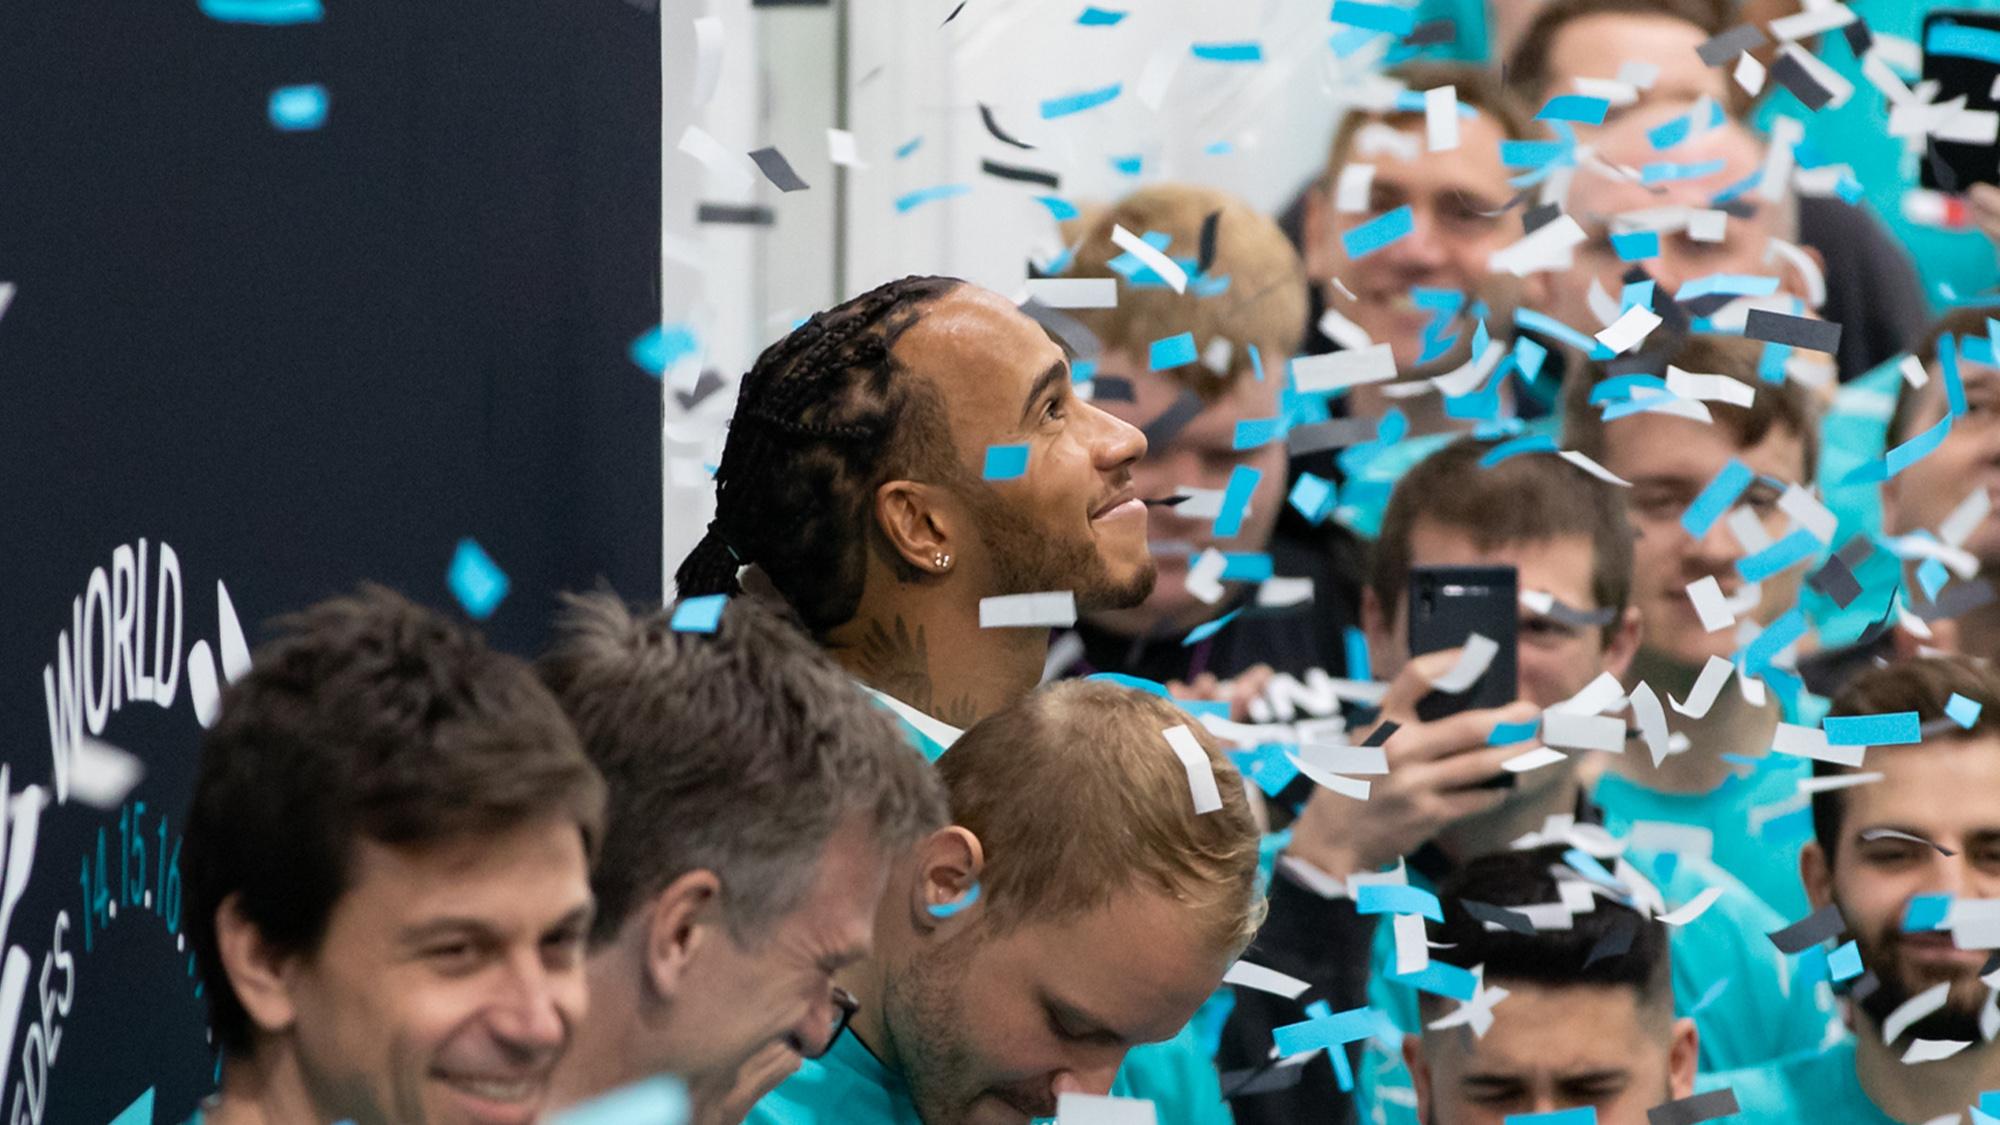 Lewis Hamilton during Mercedes 2019 F1 title celebrations